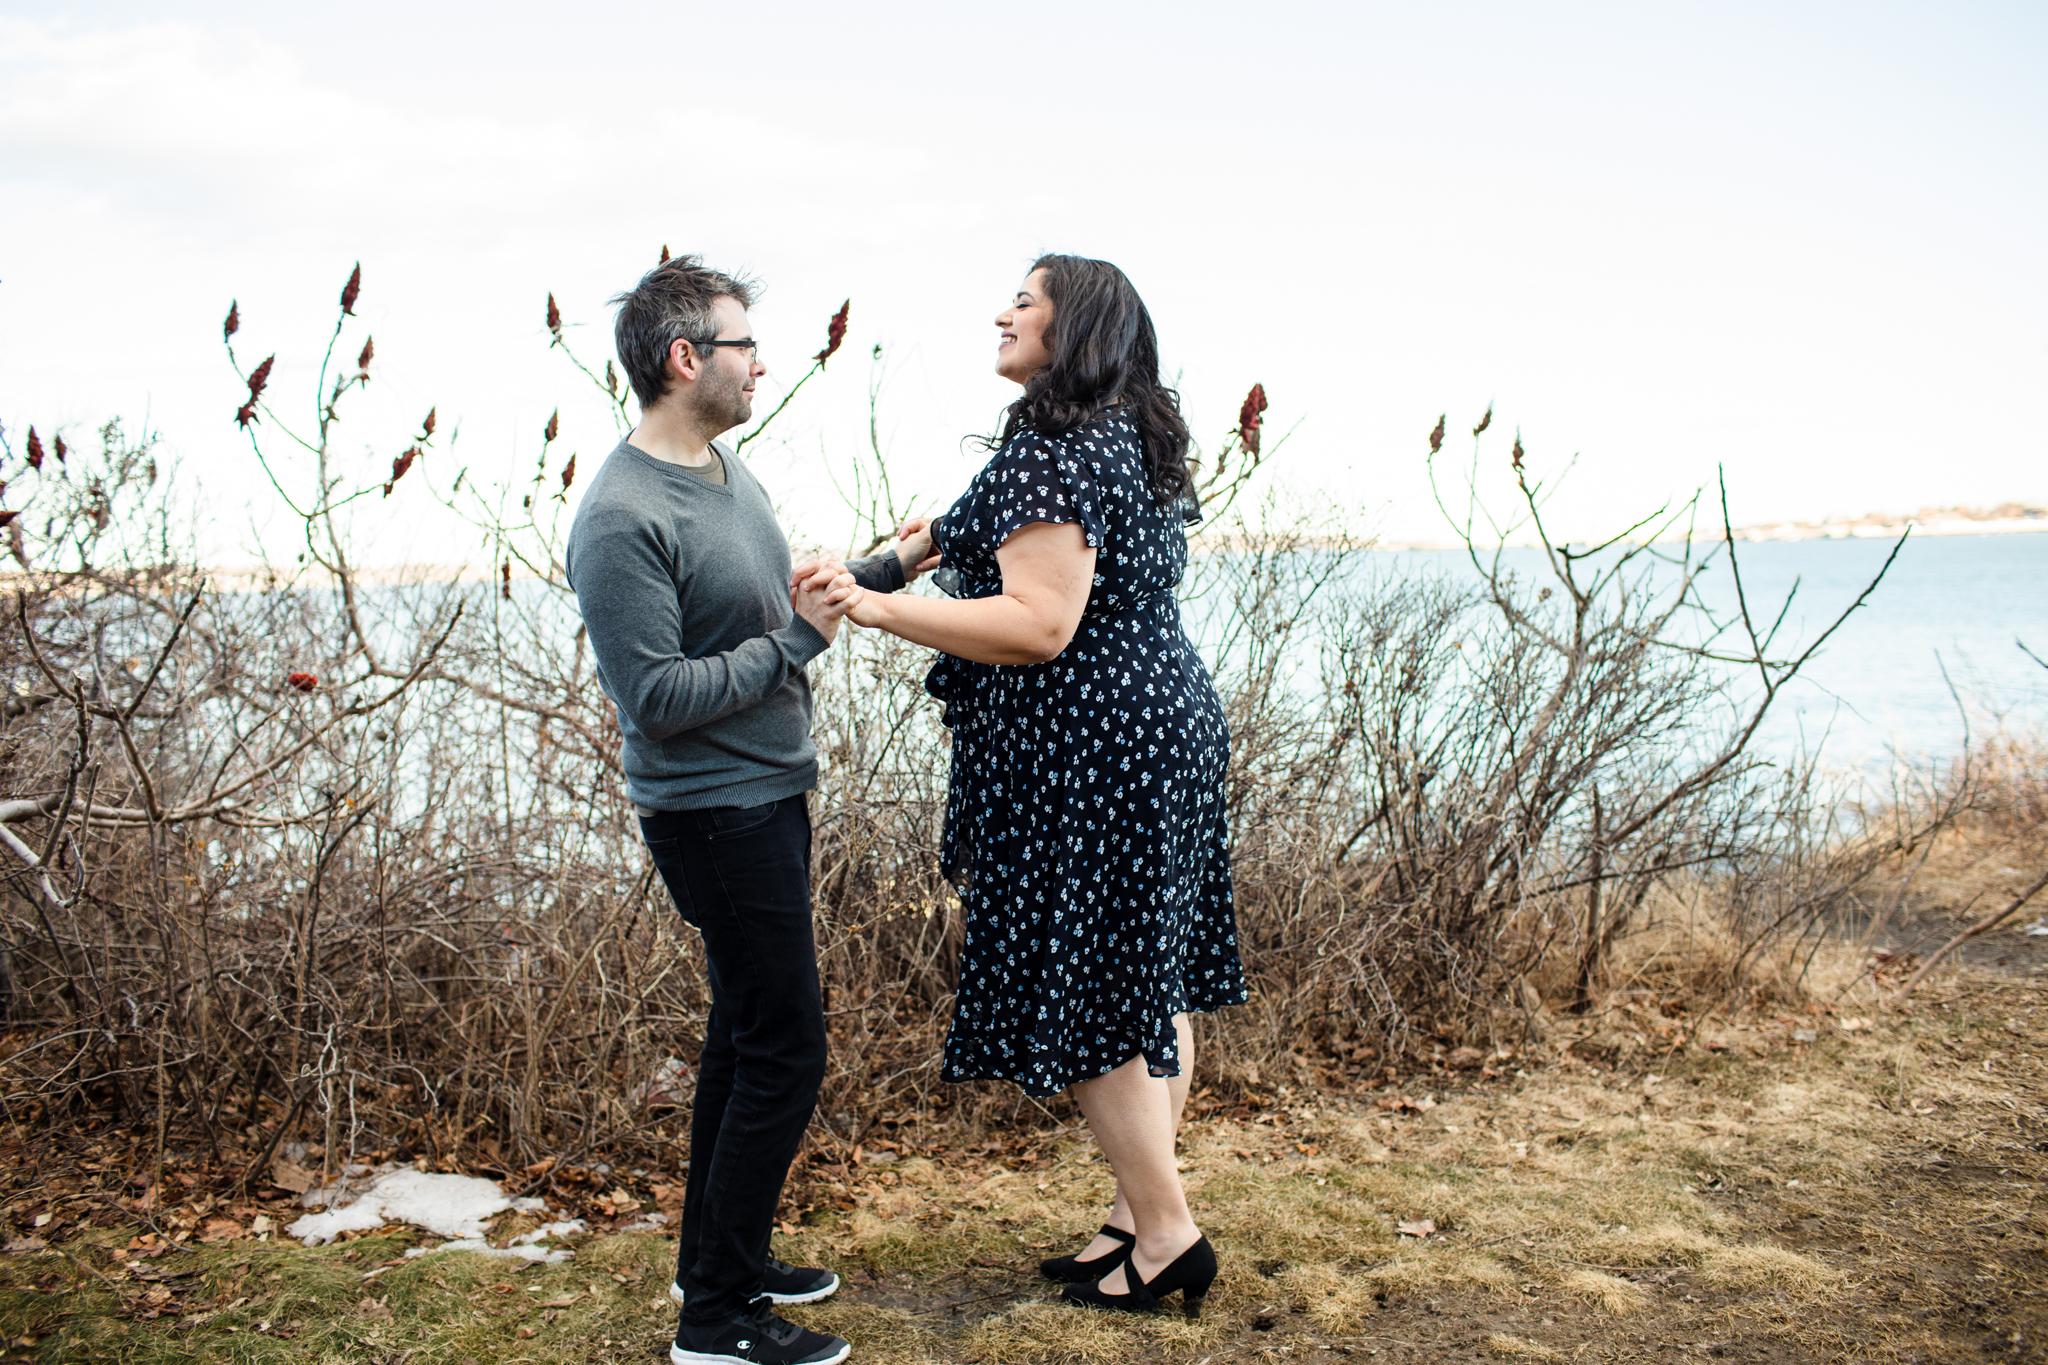 maine-wedding-photographer-engagement-session  -17.jpg